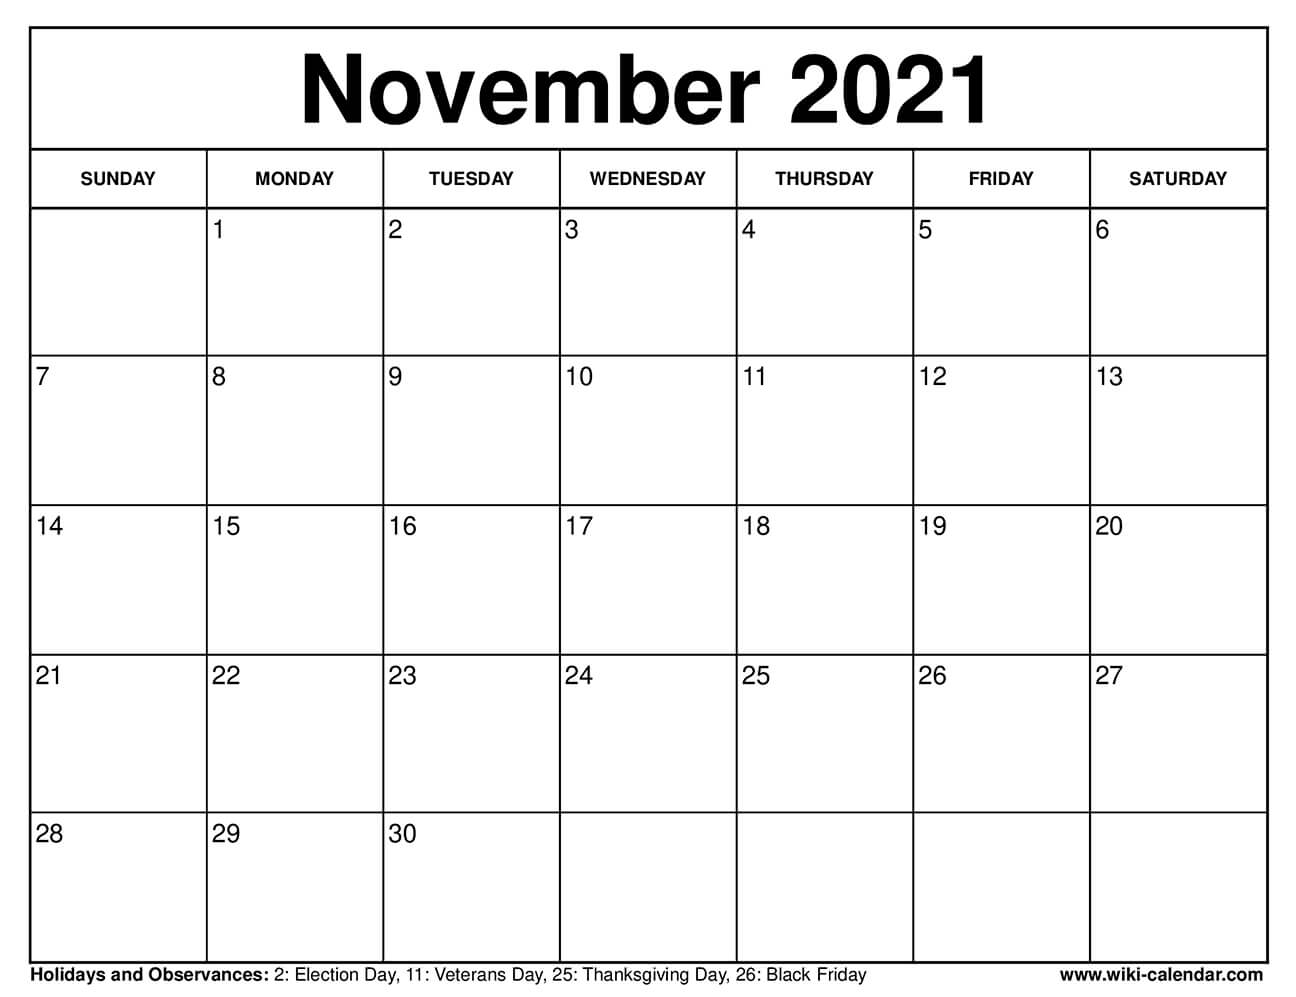 November 2021 Calendar Printable with Holidays